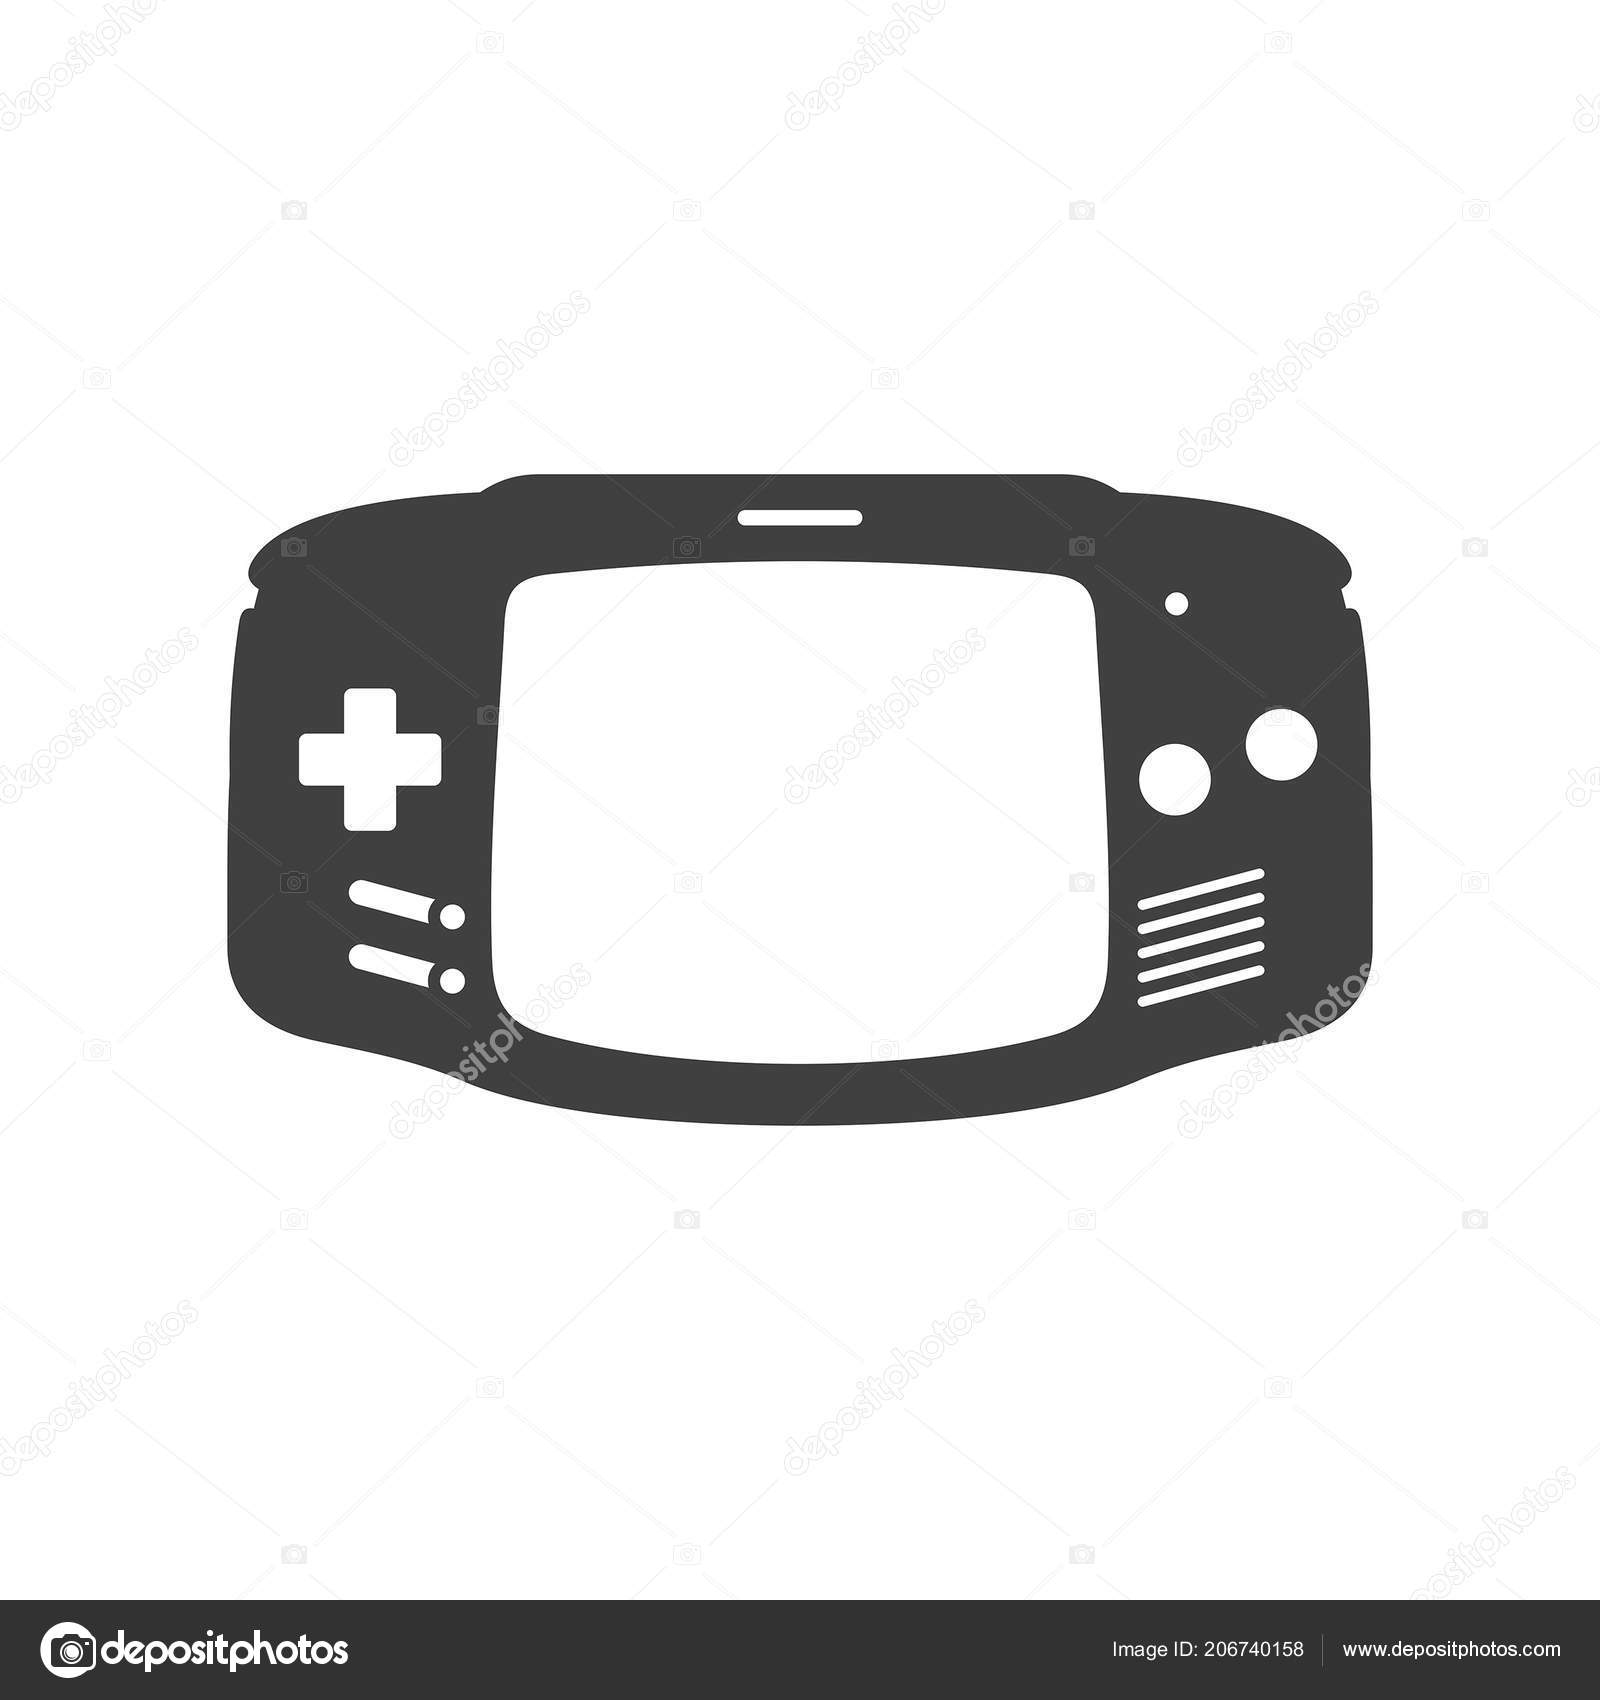 Video Game Joystick Icon Silhouette Black Isolated White Background